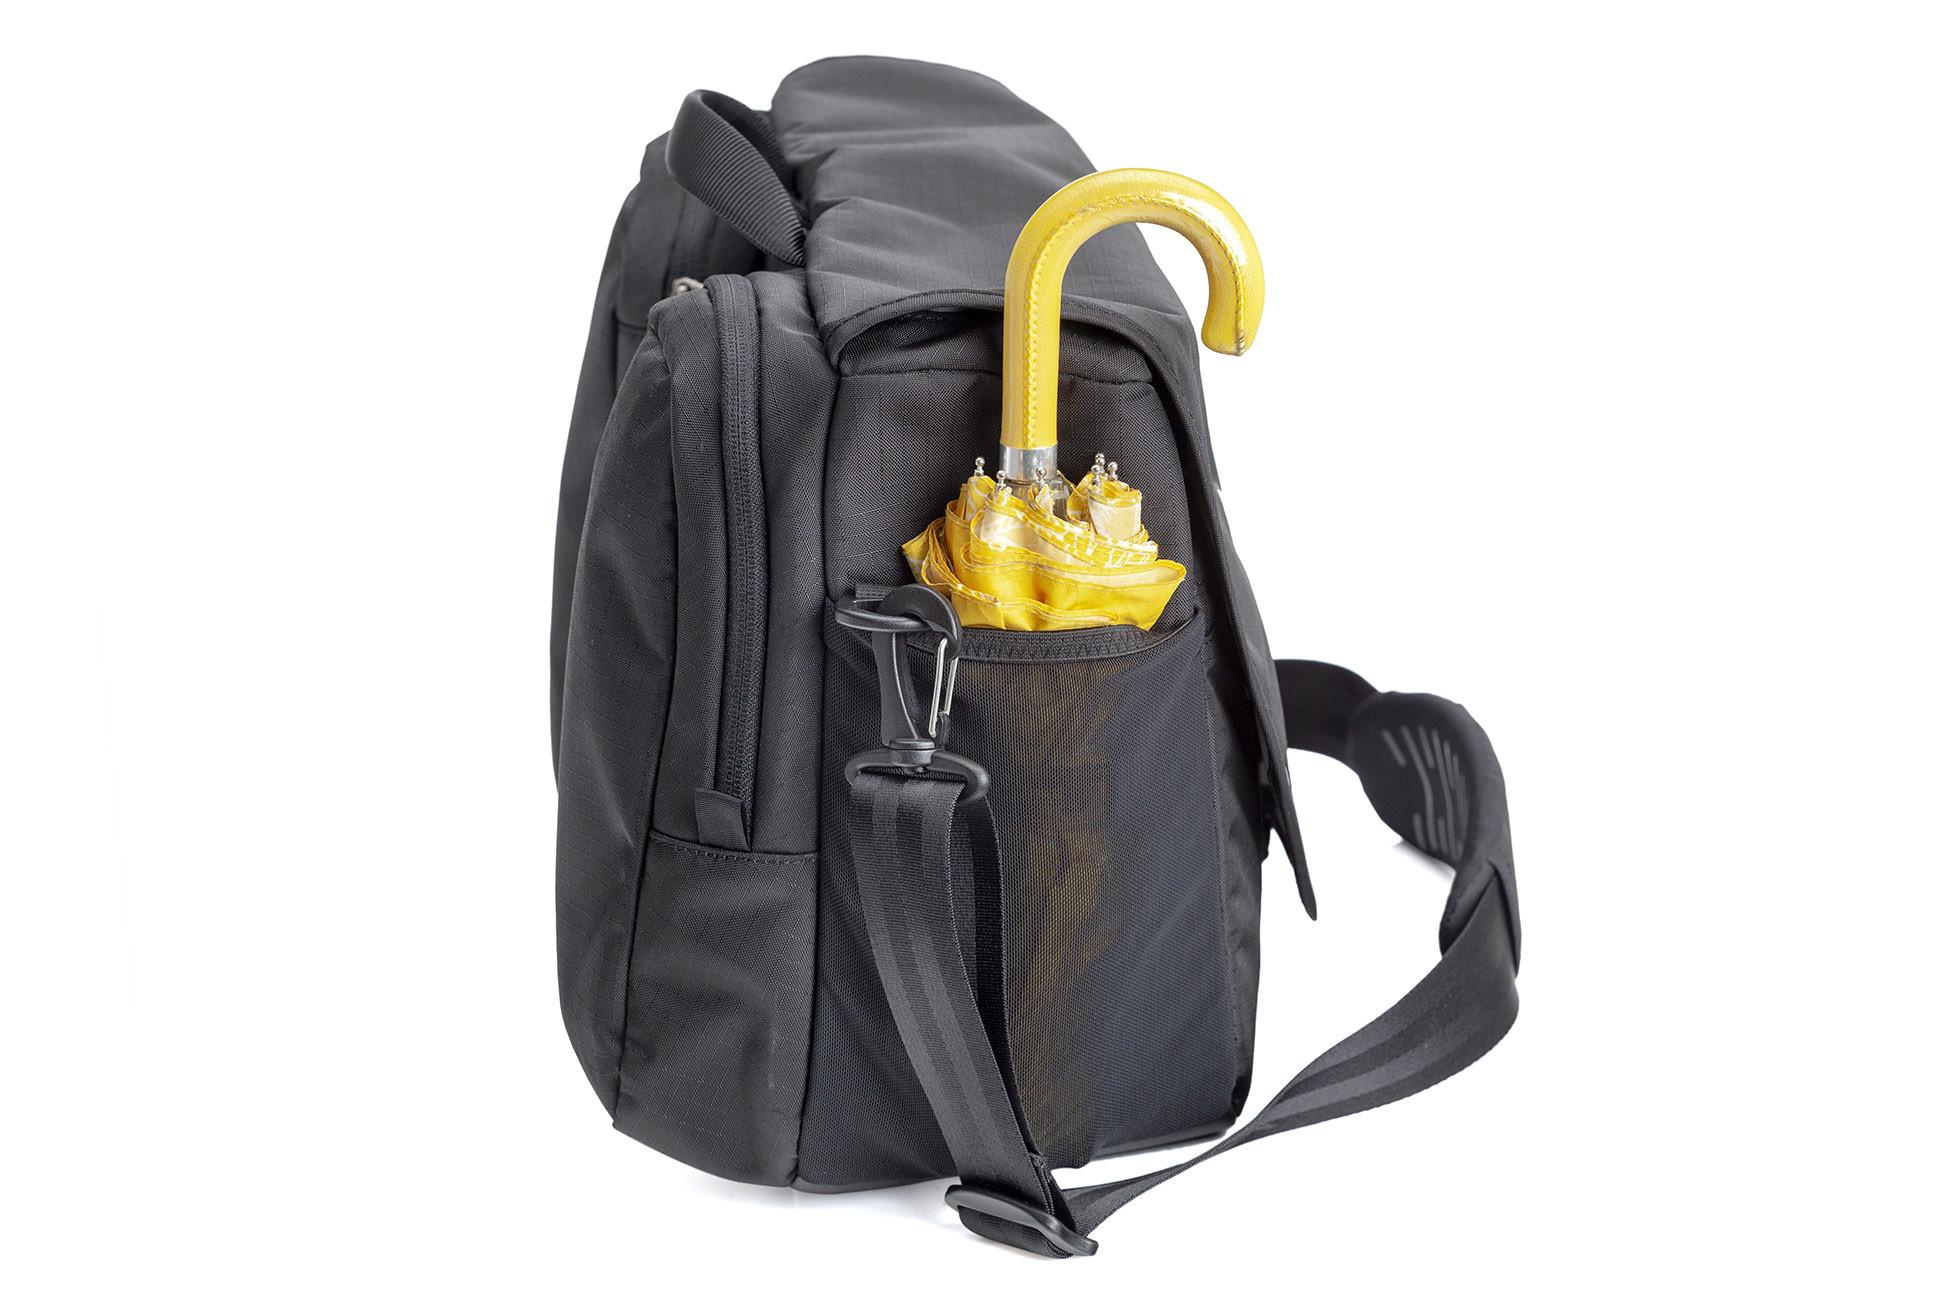 Tern Tern Go-To Bag, with Klickfix Mount